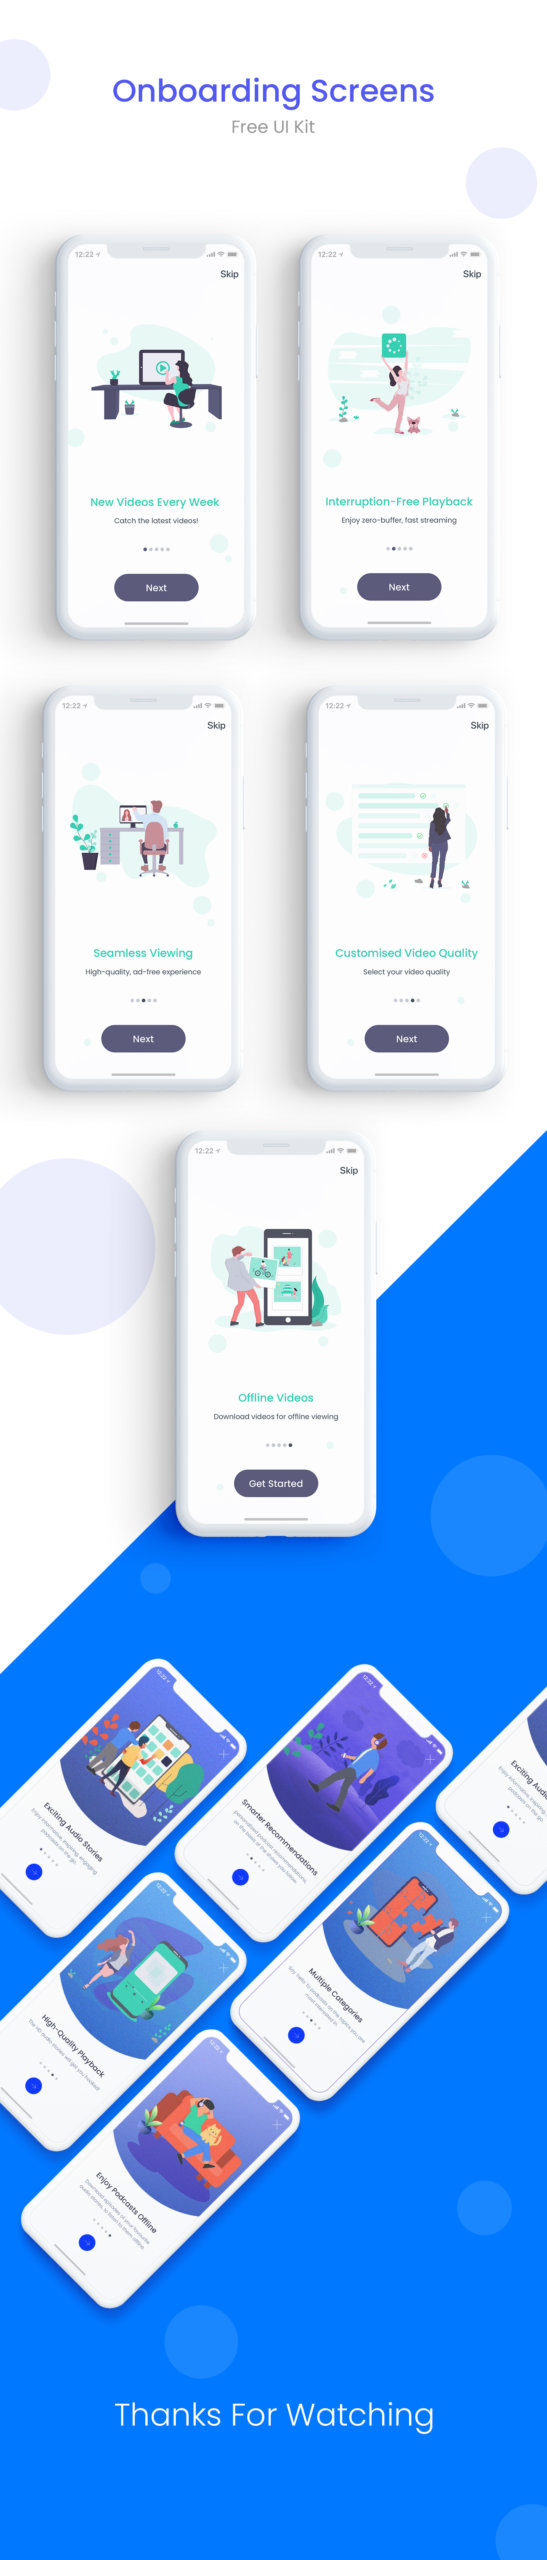 App Onboarding Walkthrough Screens from UIGarage